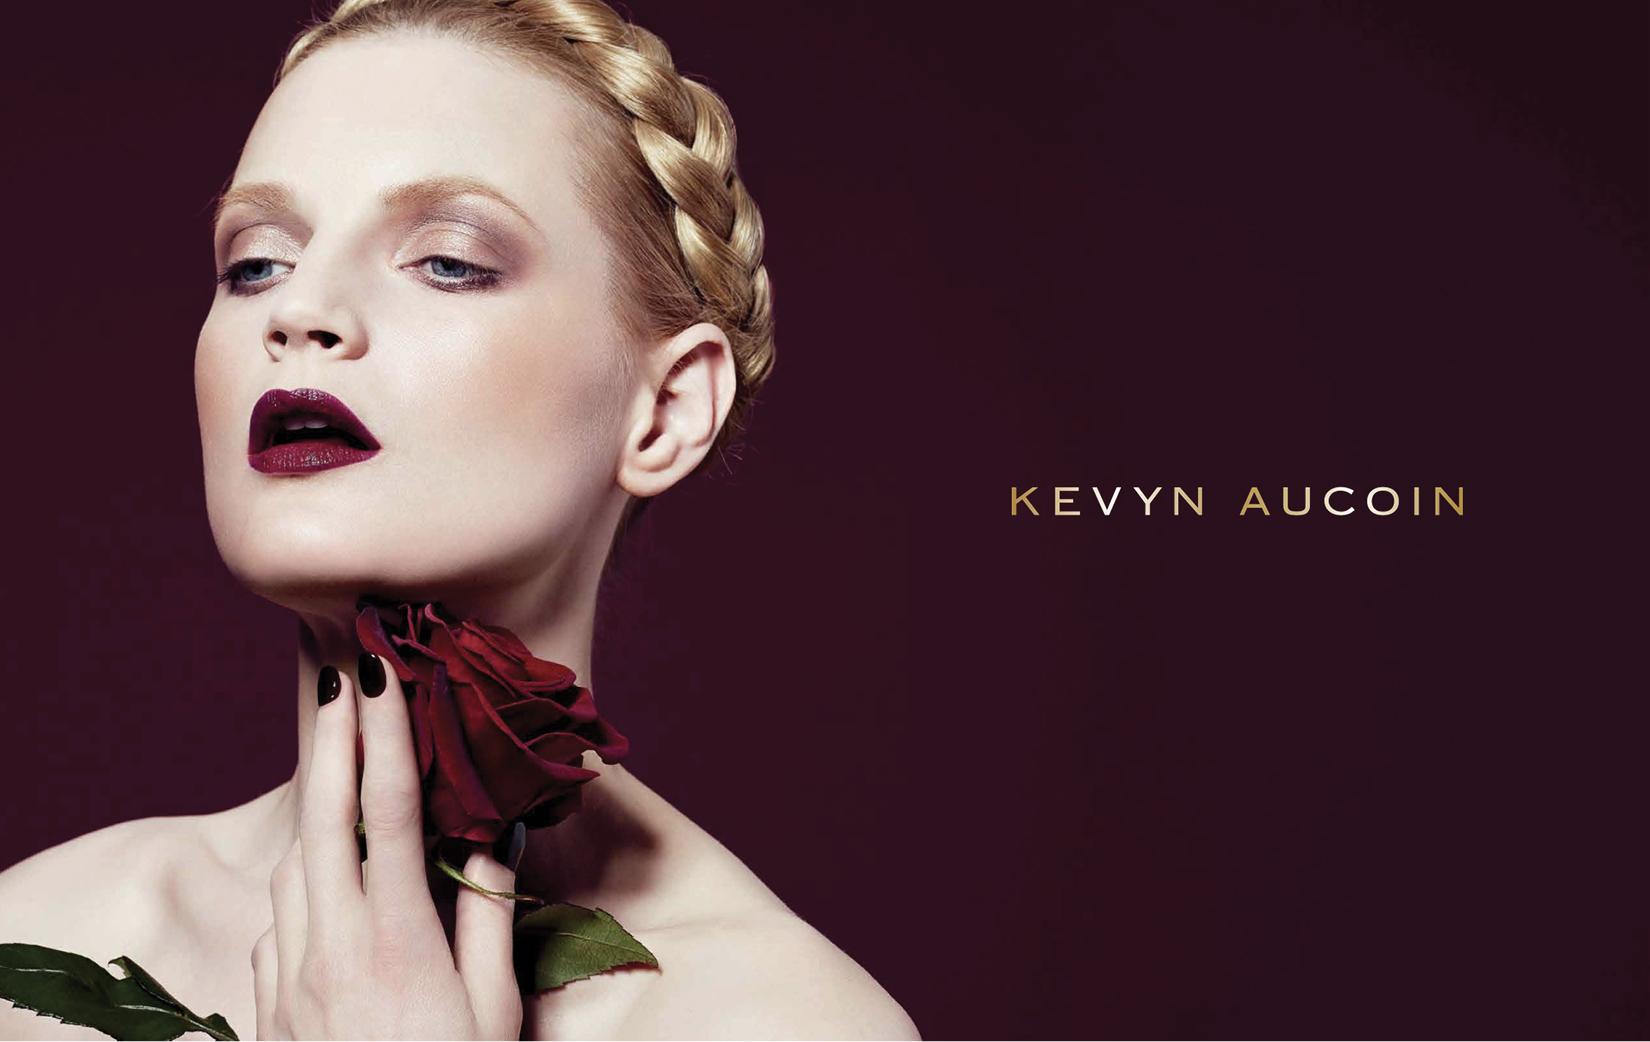 Model wearing Kevyn Aucoin cosmetics.